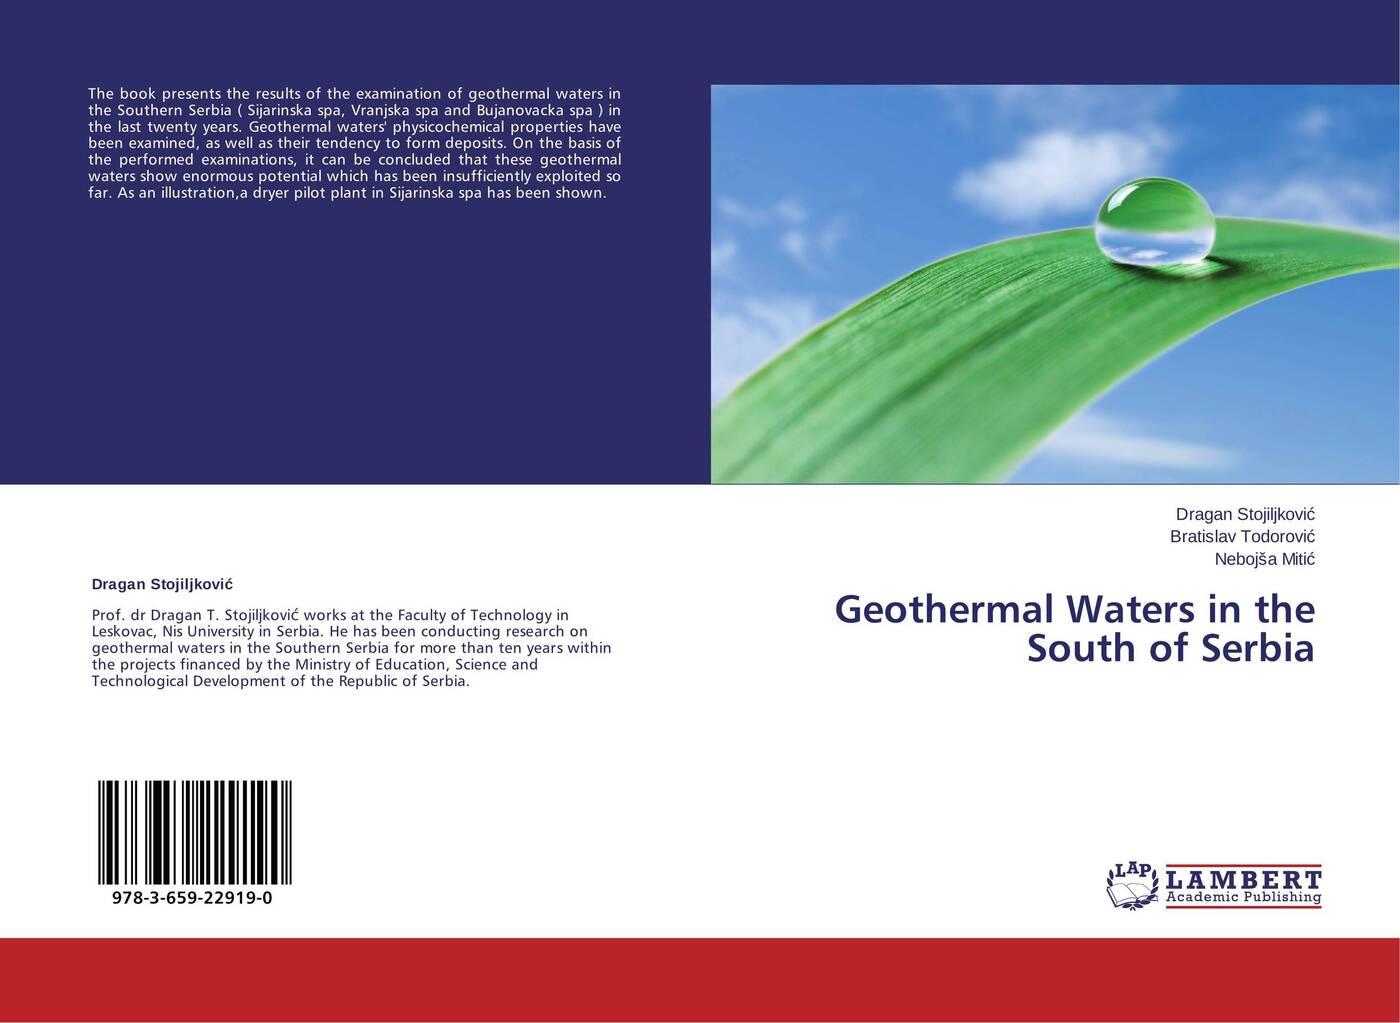 Dragan Stojiljković,Bratislav Todorović and Nebojša Mitić Geothermal Waters in the South of Serbia waters and the wild air exp